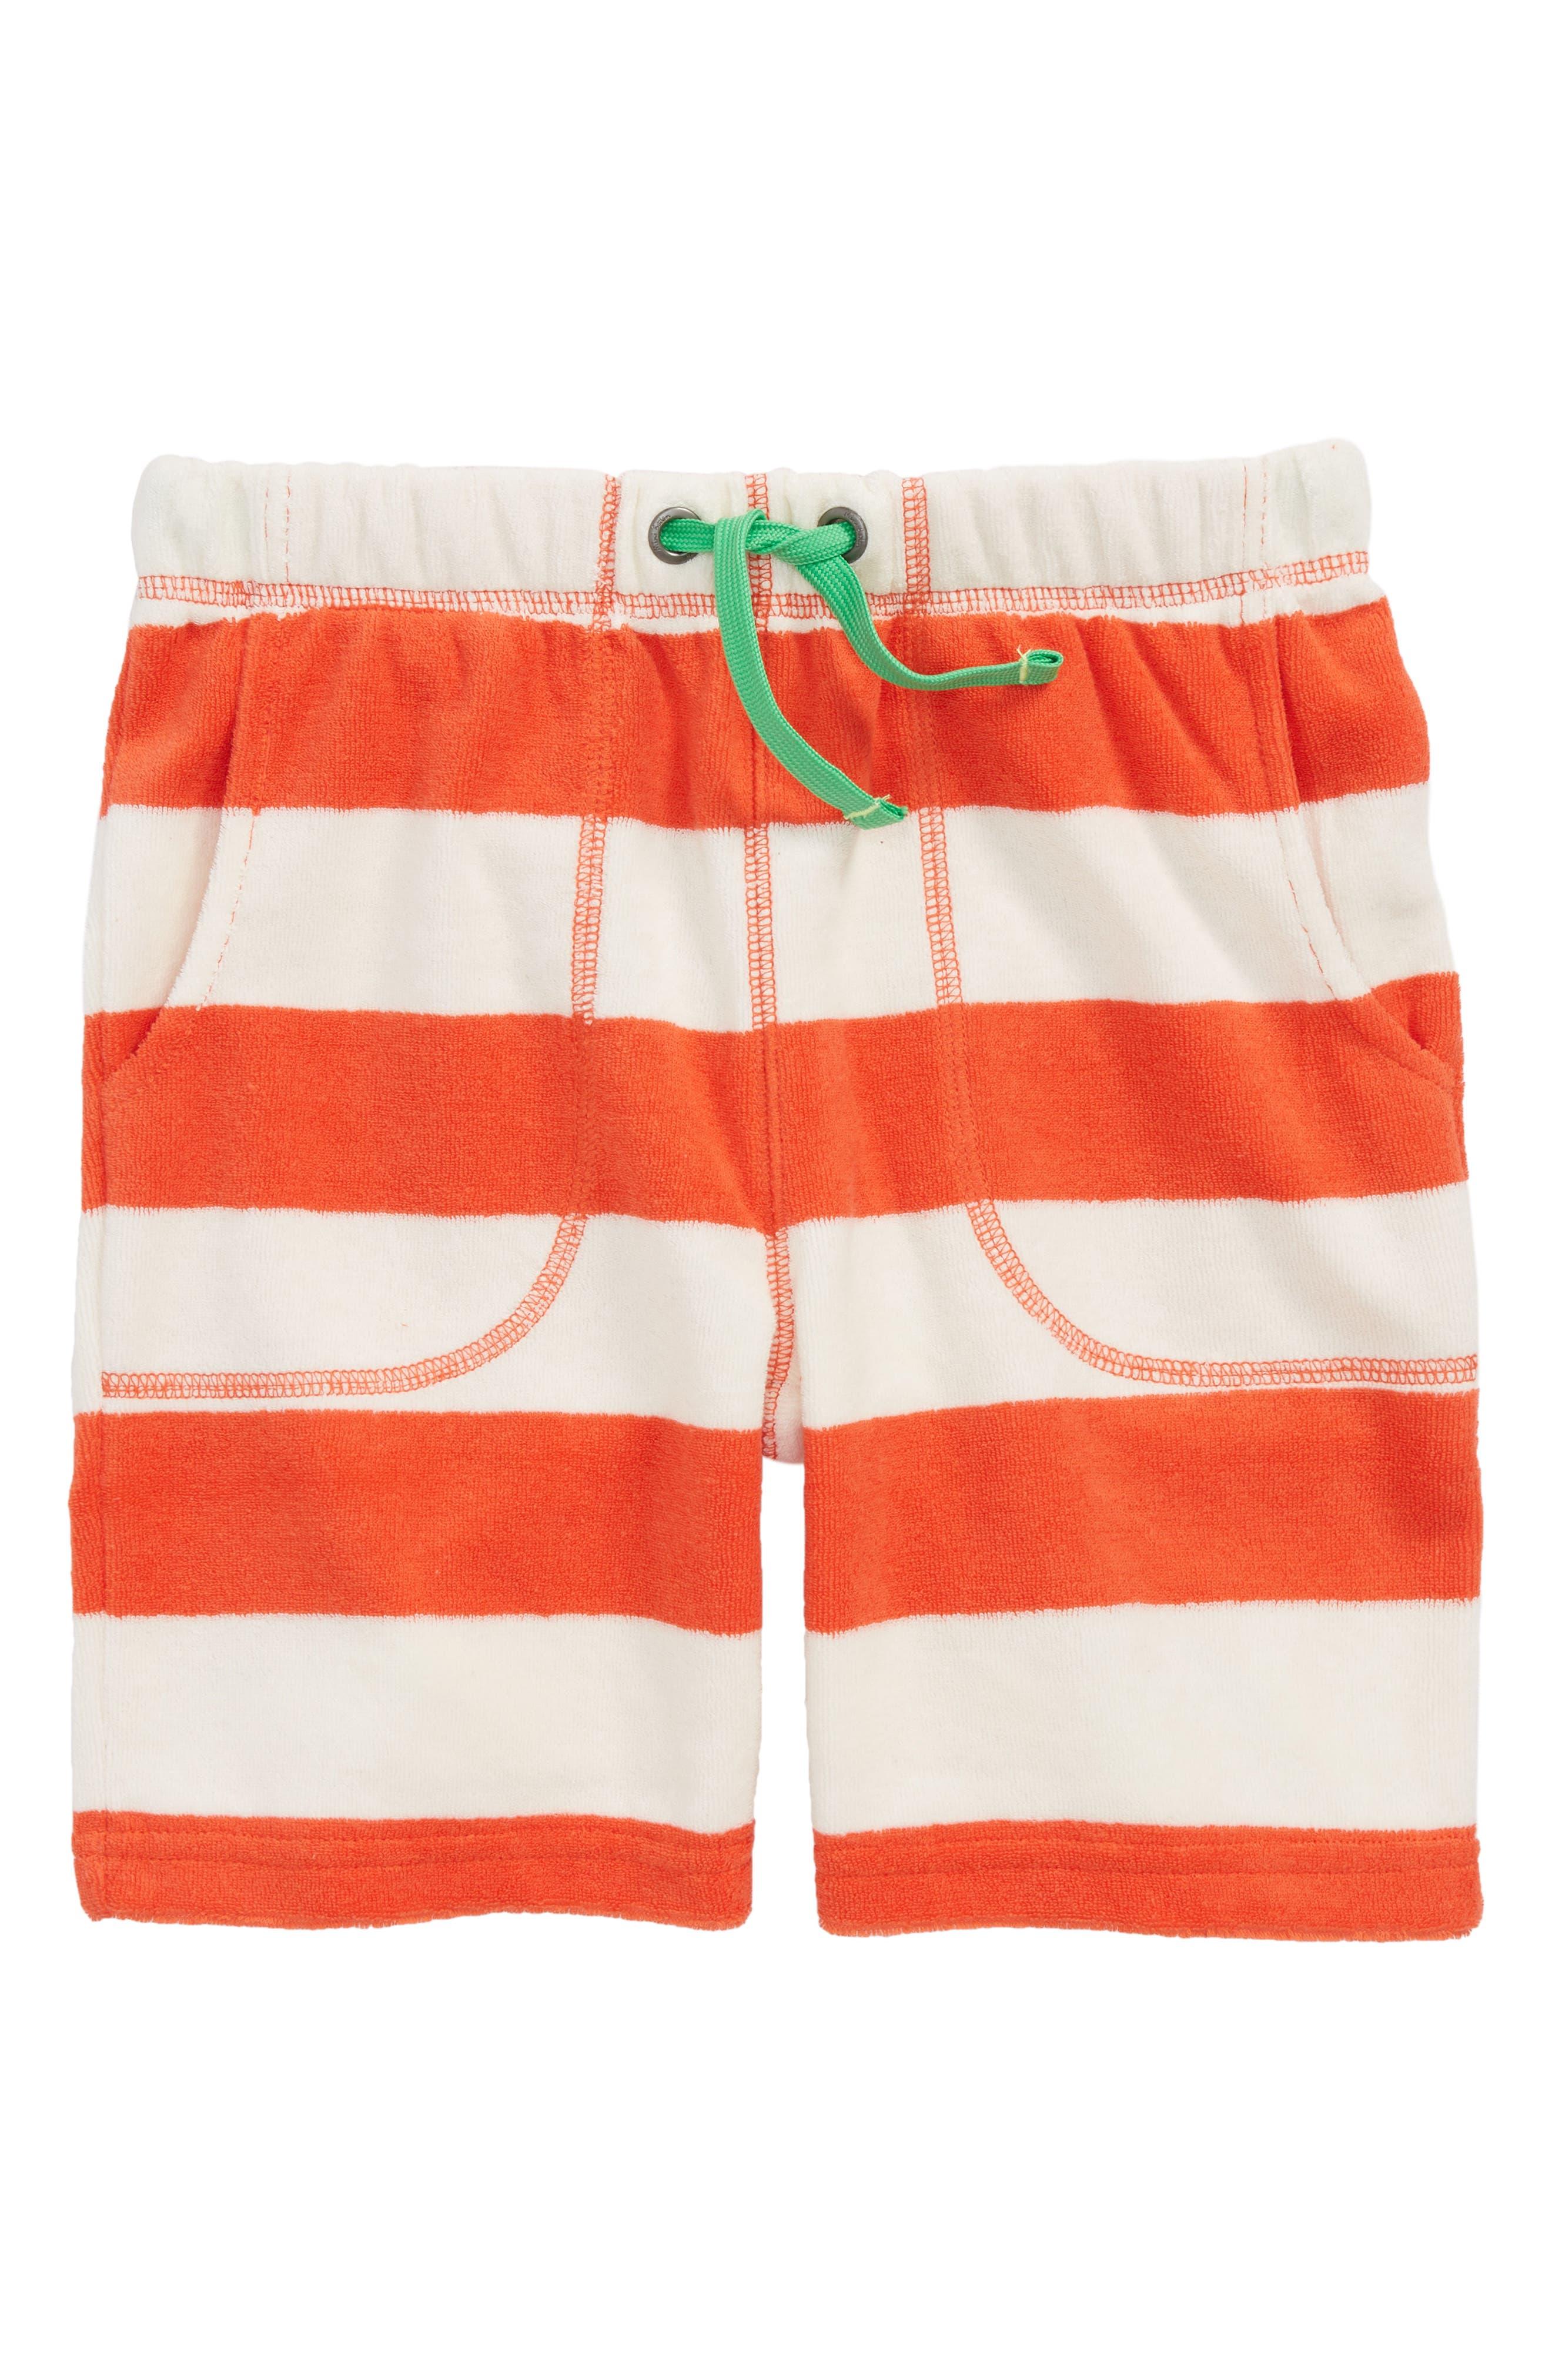 Stripe Toweling Shorts,                         Main,                         color, Melon Crush Red/ Ecru